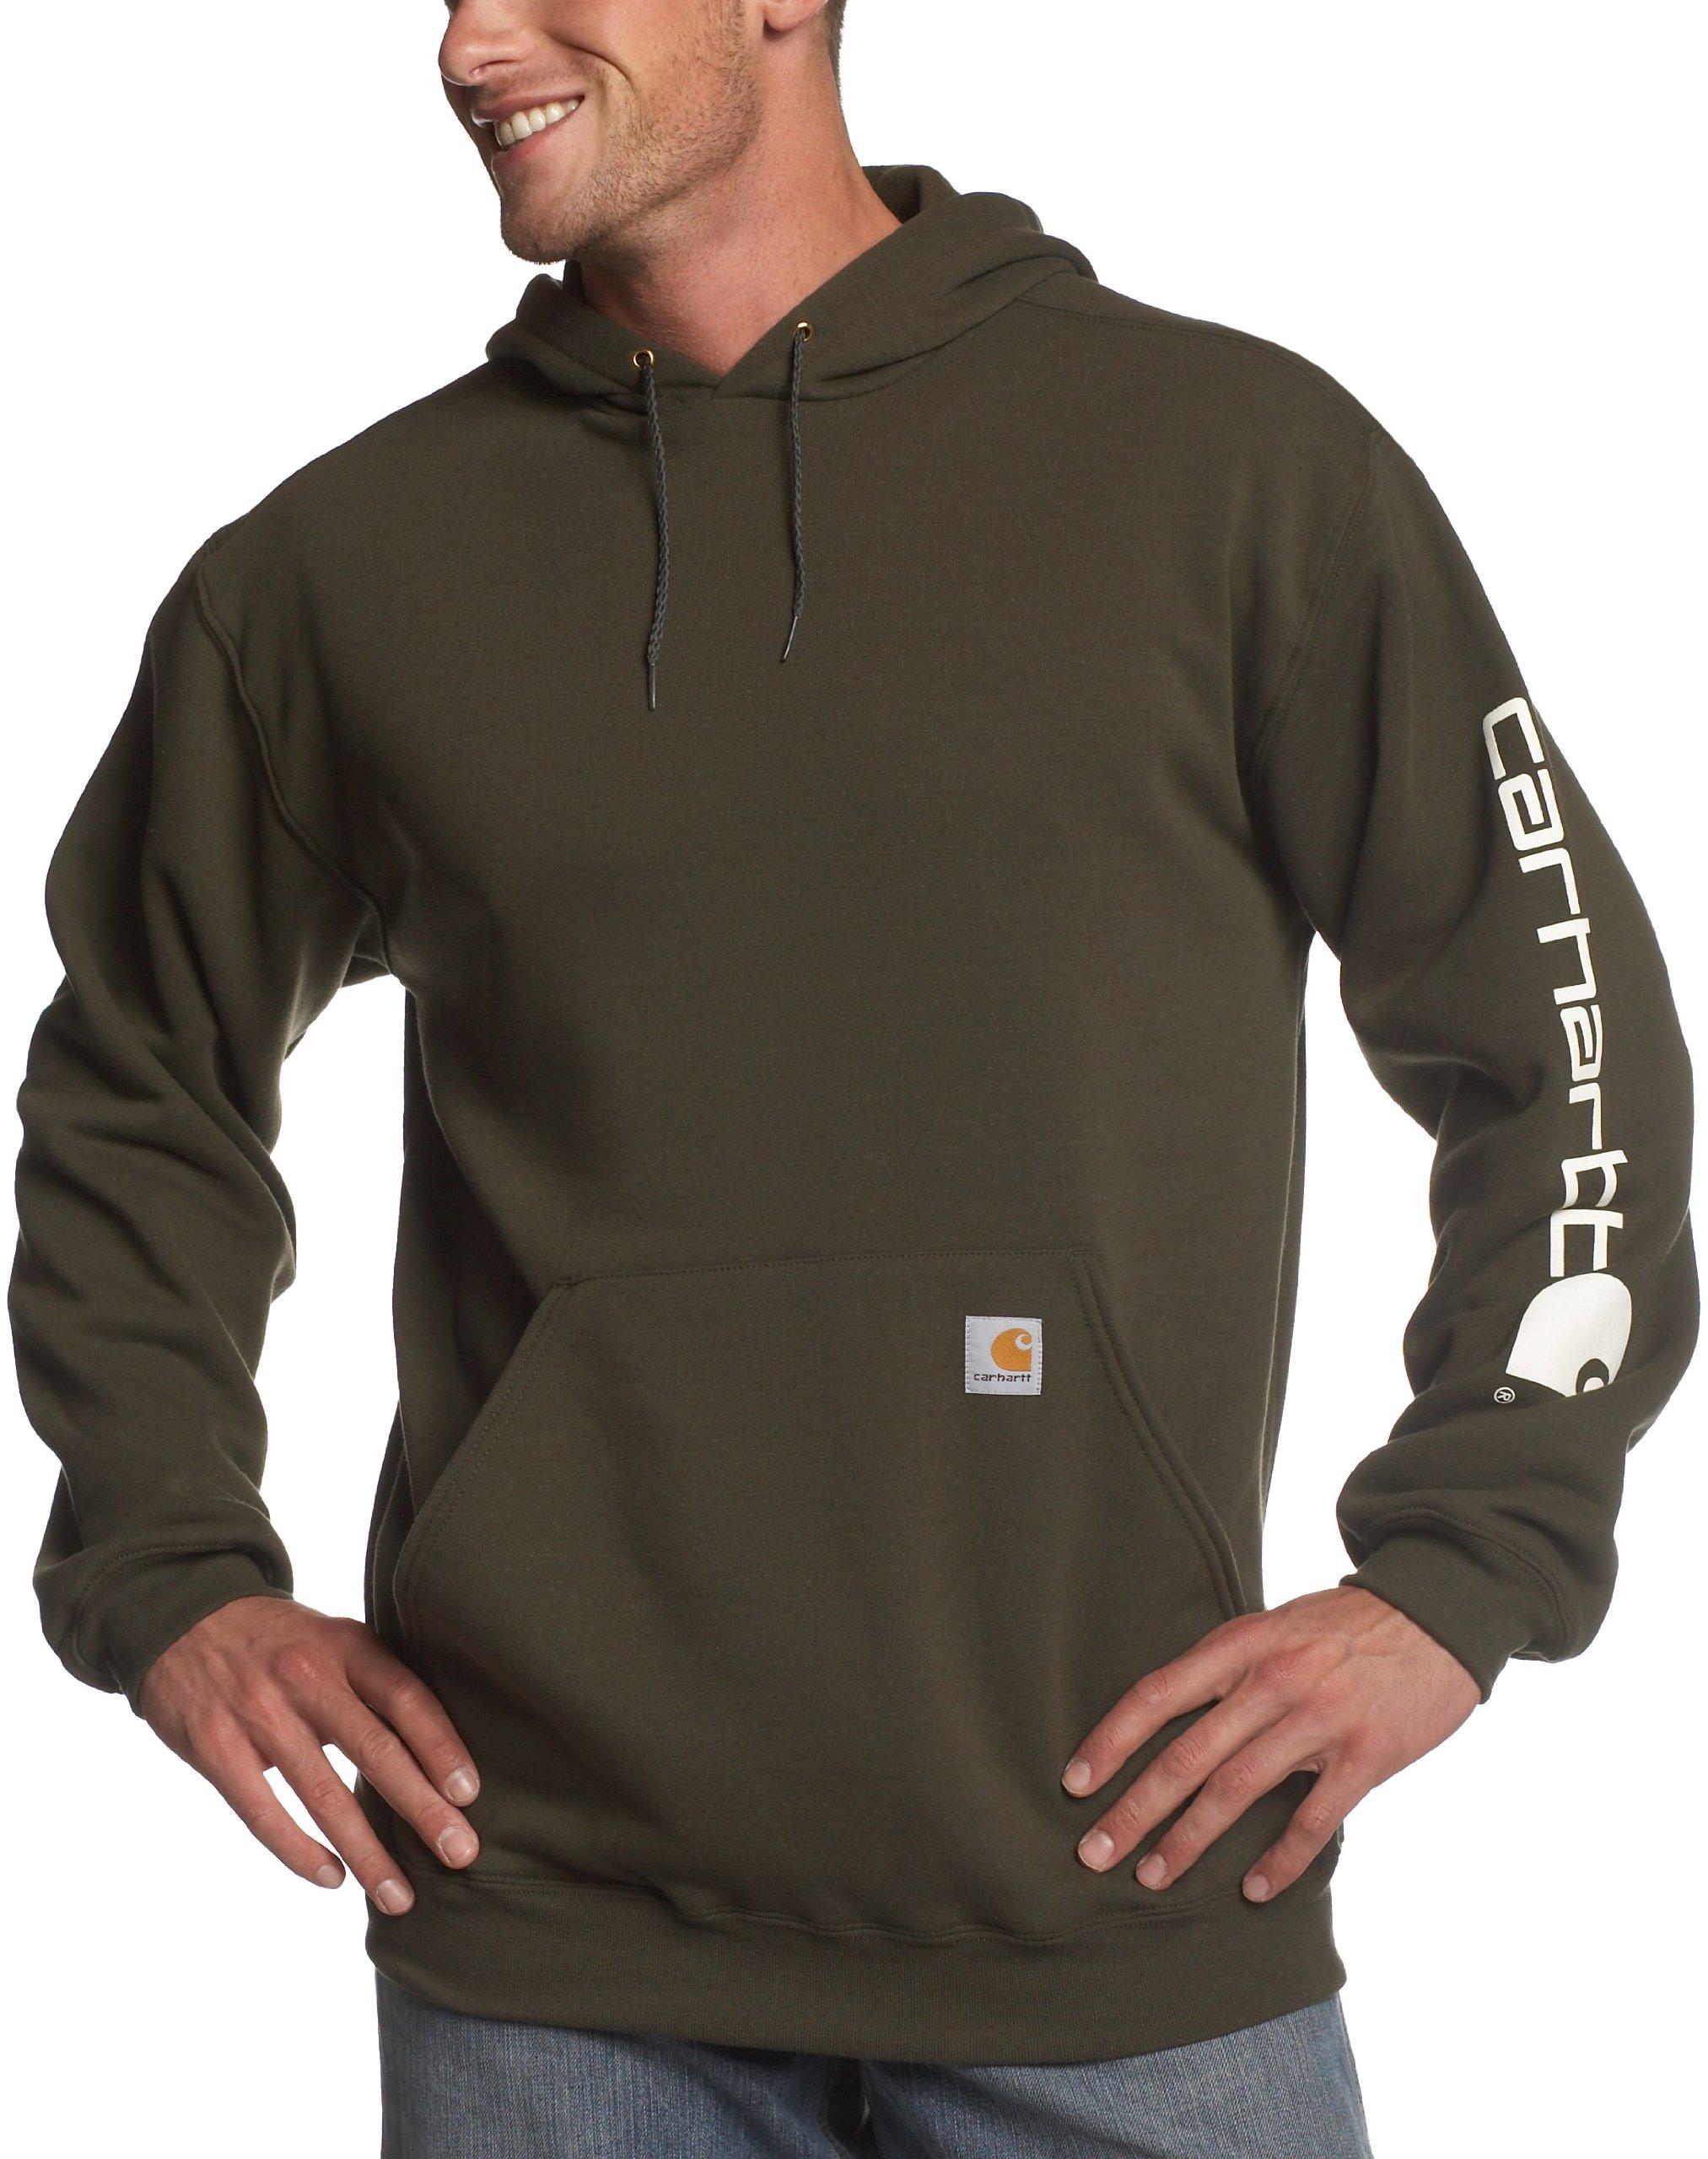 Carhartt Men's Midweight Sleeve Logo Hooded Sweatshirt,Olive  (Closeout),3X-Large